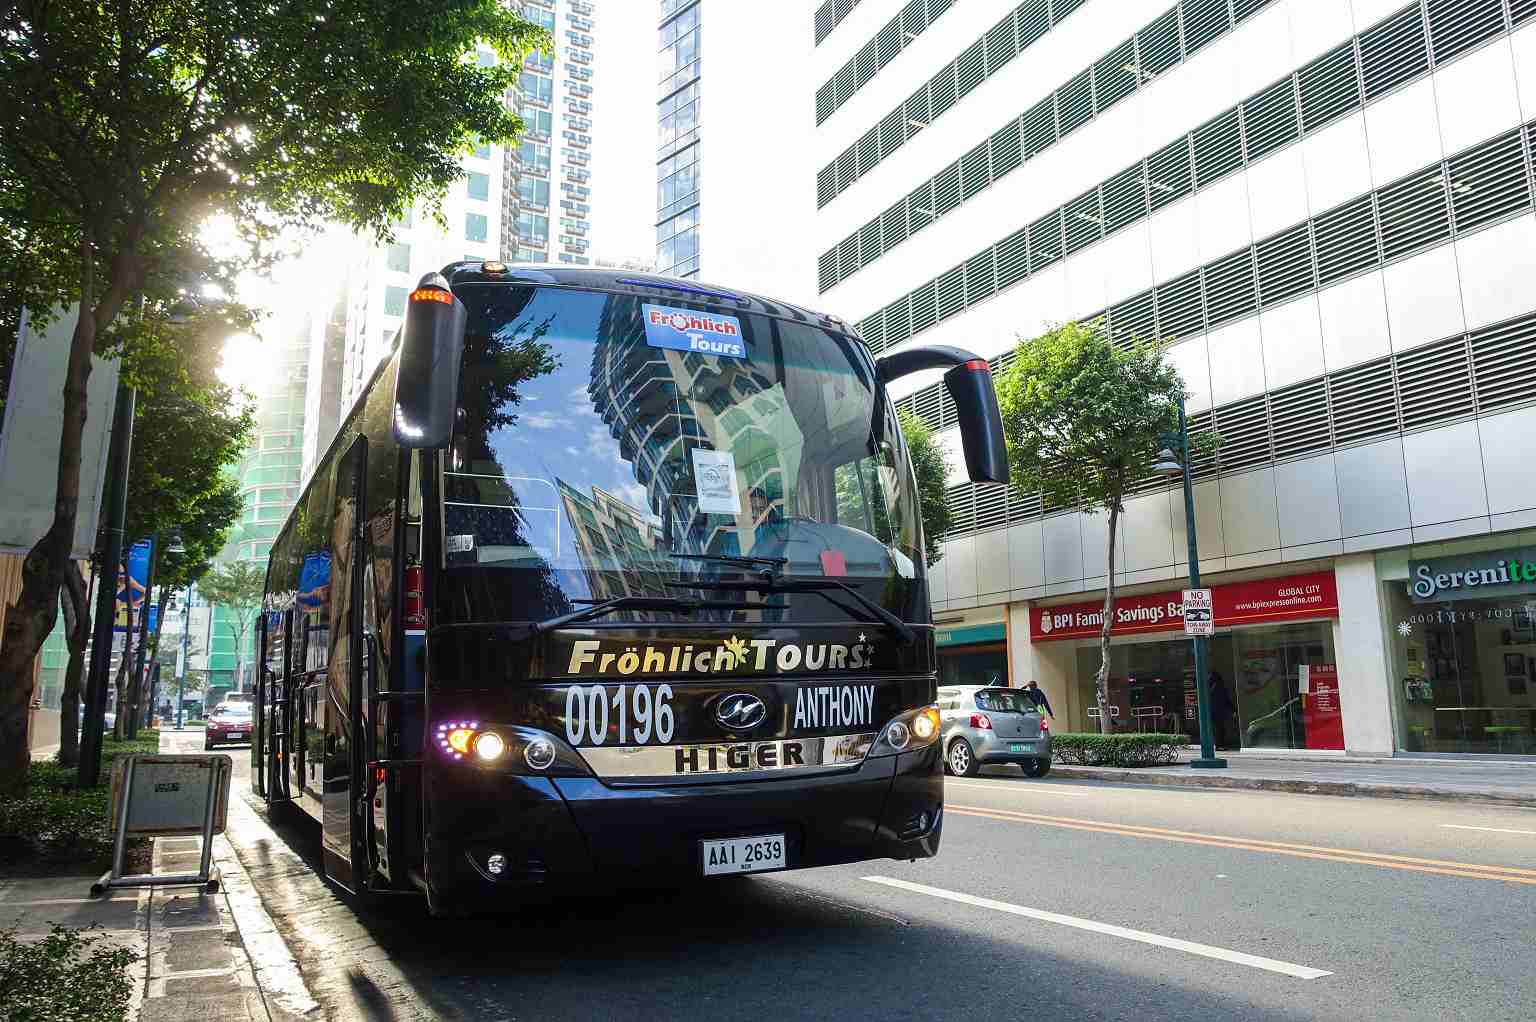 The Binge Bus in Bonifacio Global City, Manila, Philippines